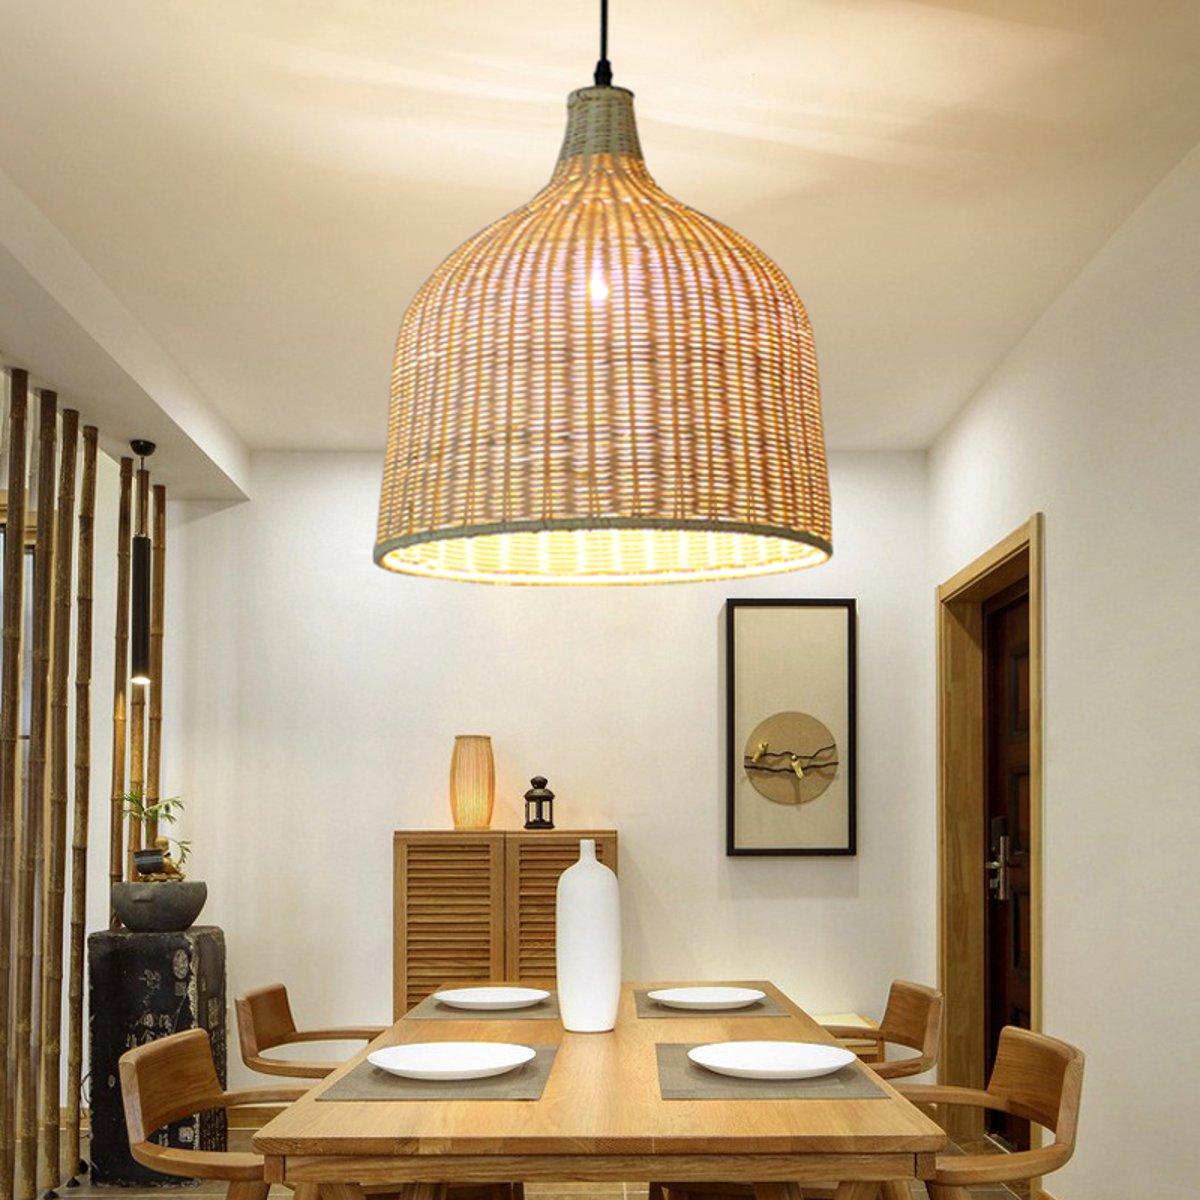 Modern Rattan Pendant Light Lamp Home Room Teahouse Decoration Fixture Bar Indoor Lighting Handmade Lamp Cover E27